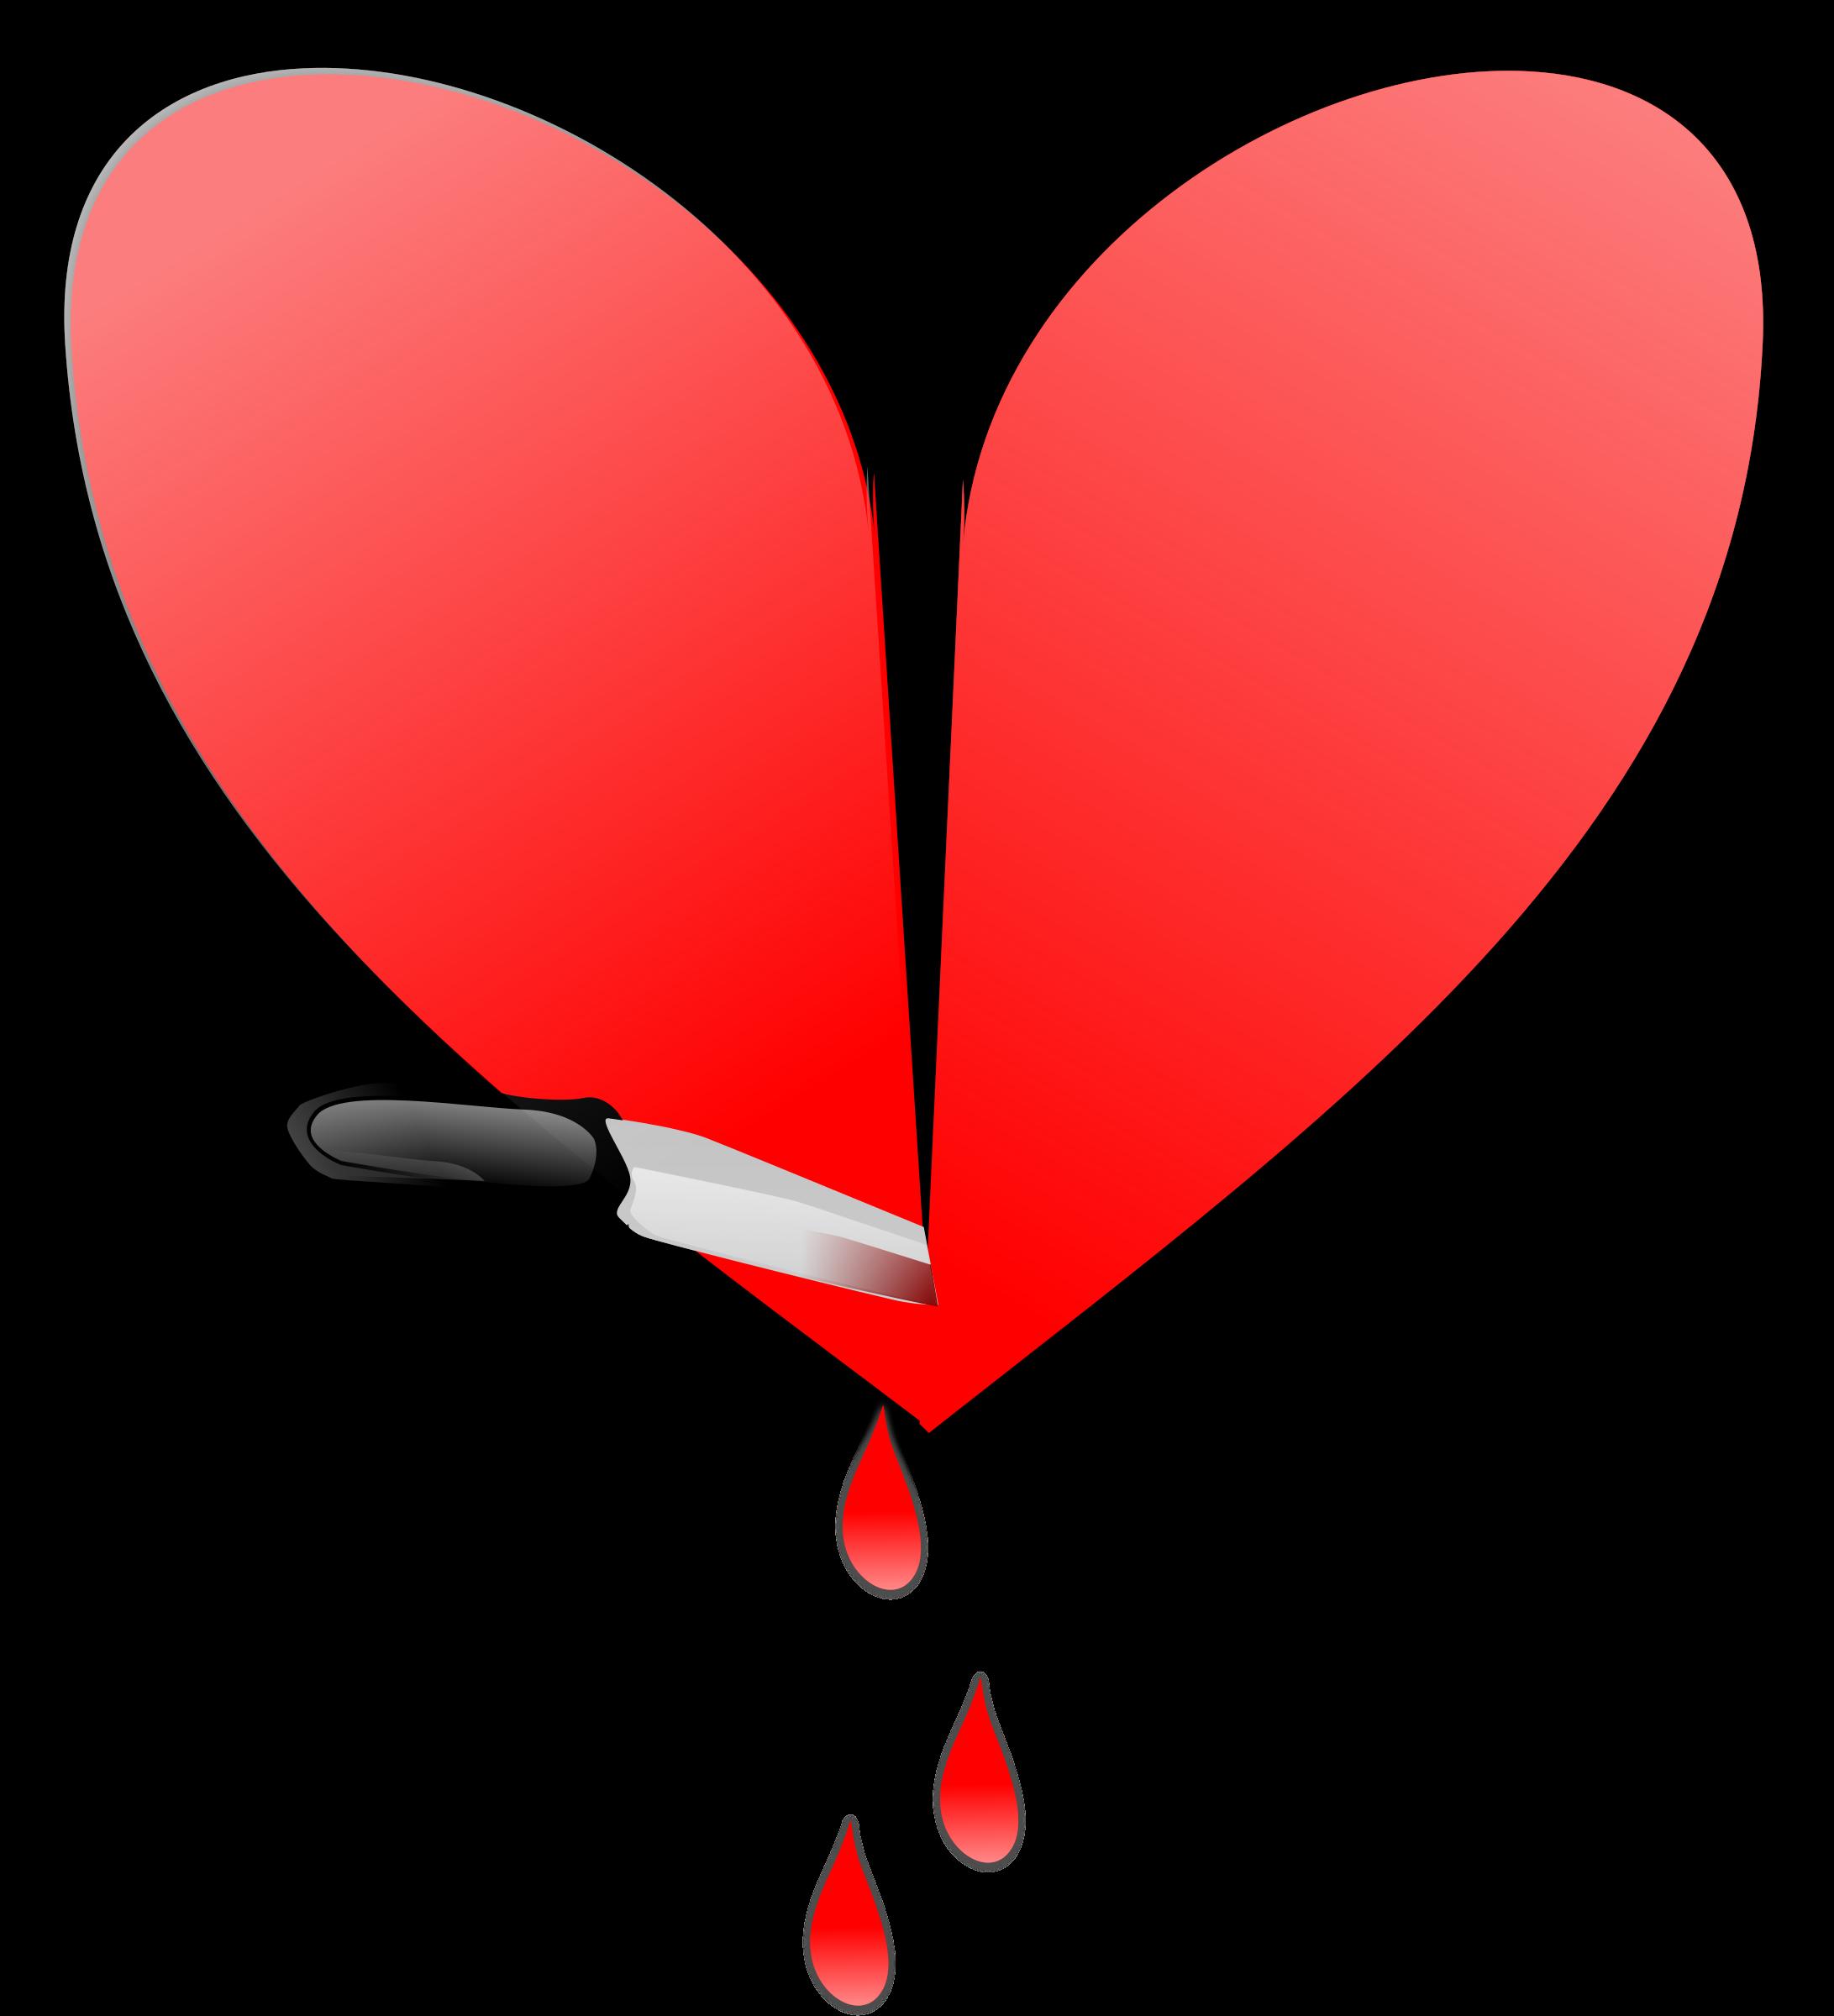 Heart big image png. People clipart broken hearted